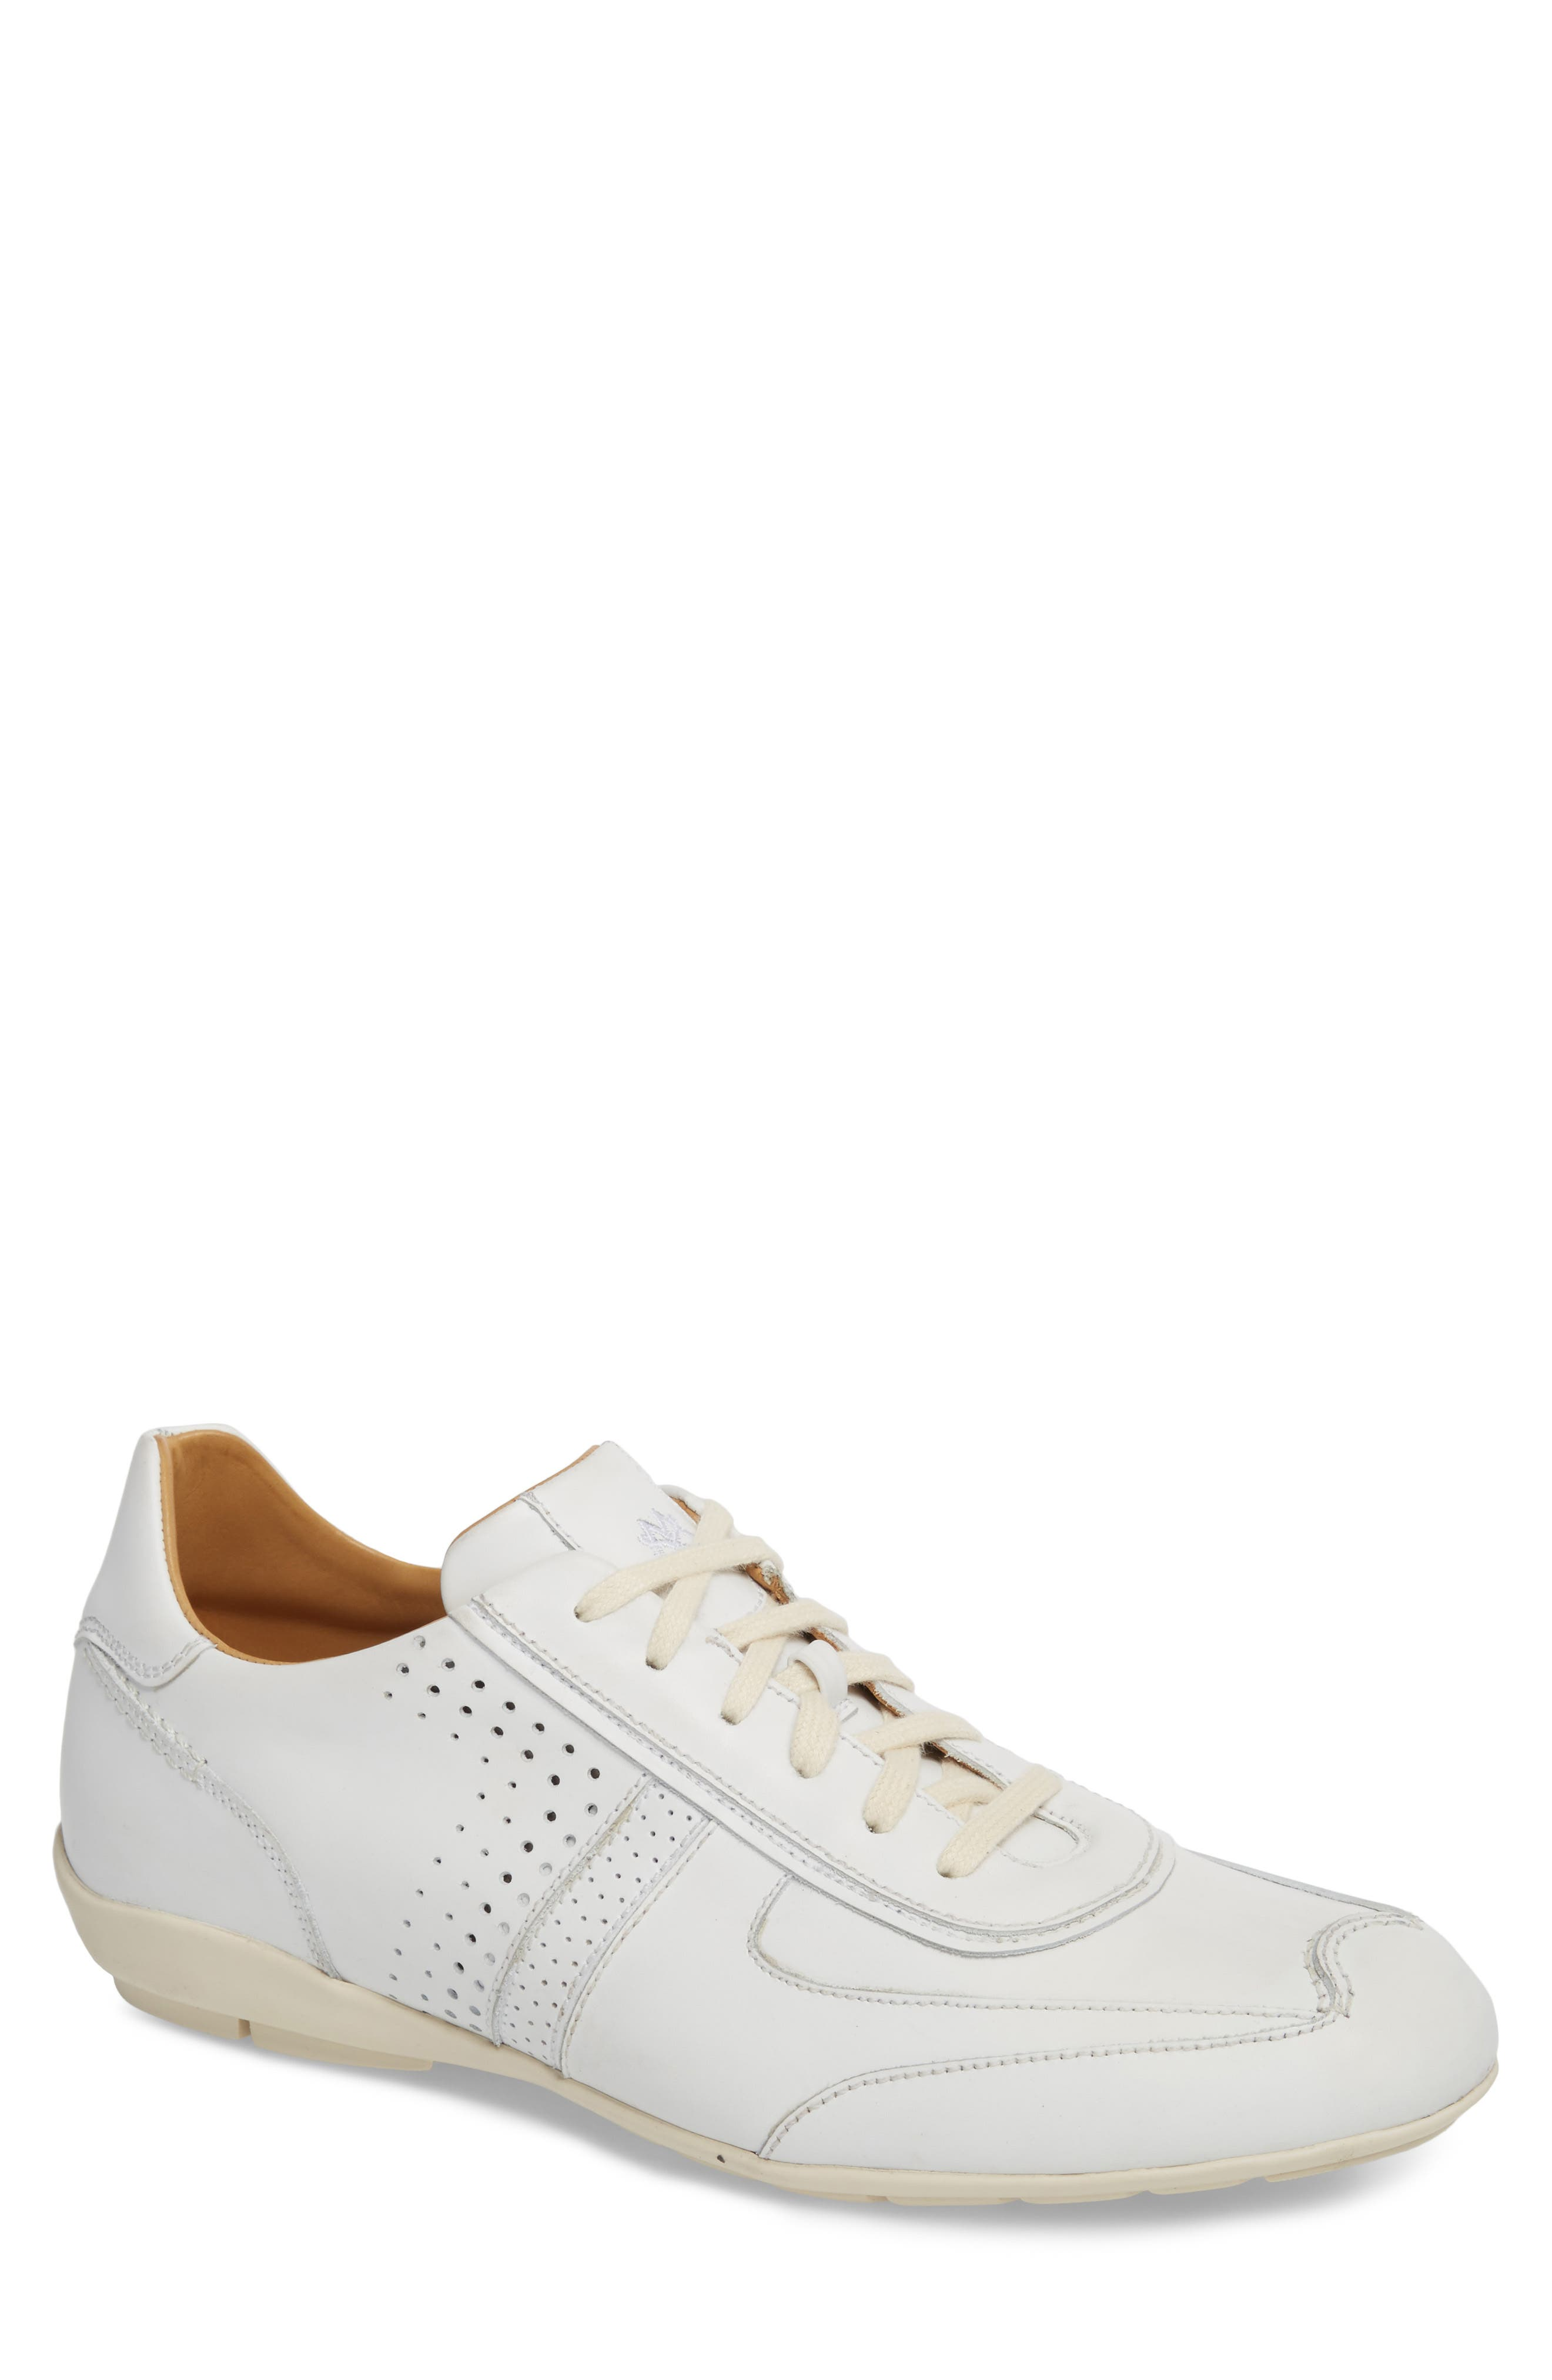 Mezlan Lozano II Low Top Sneaker (Men)